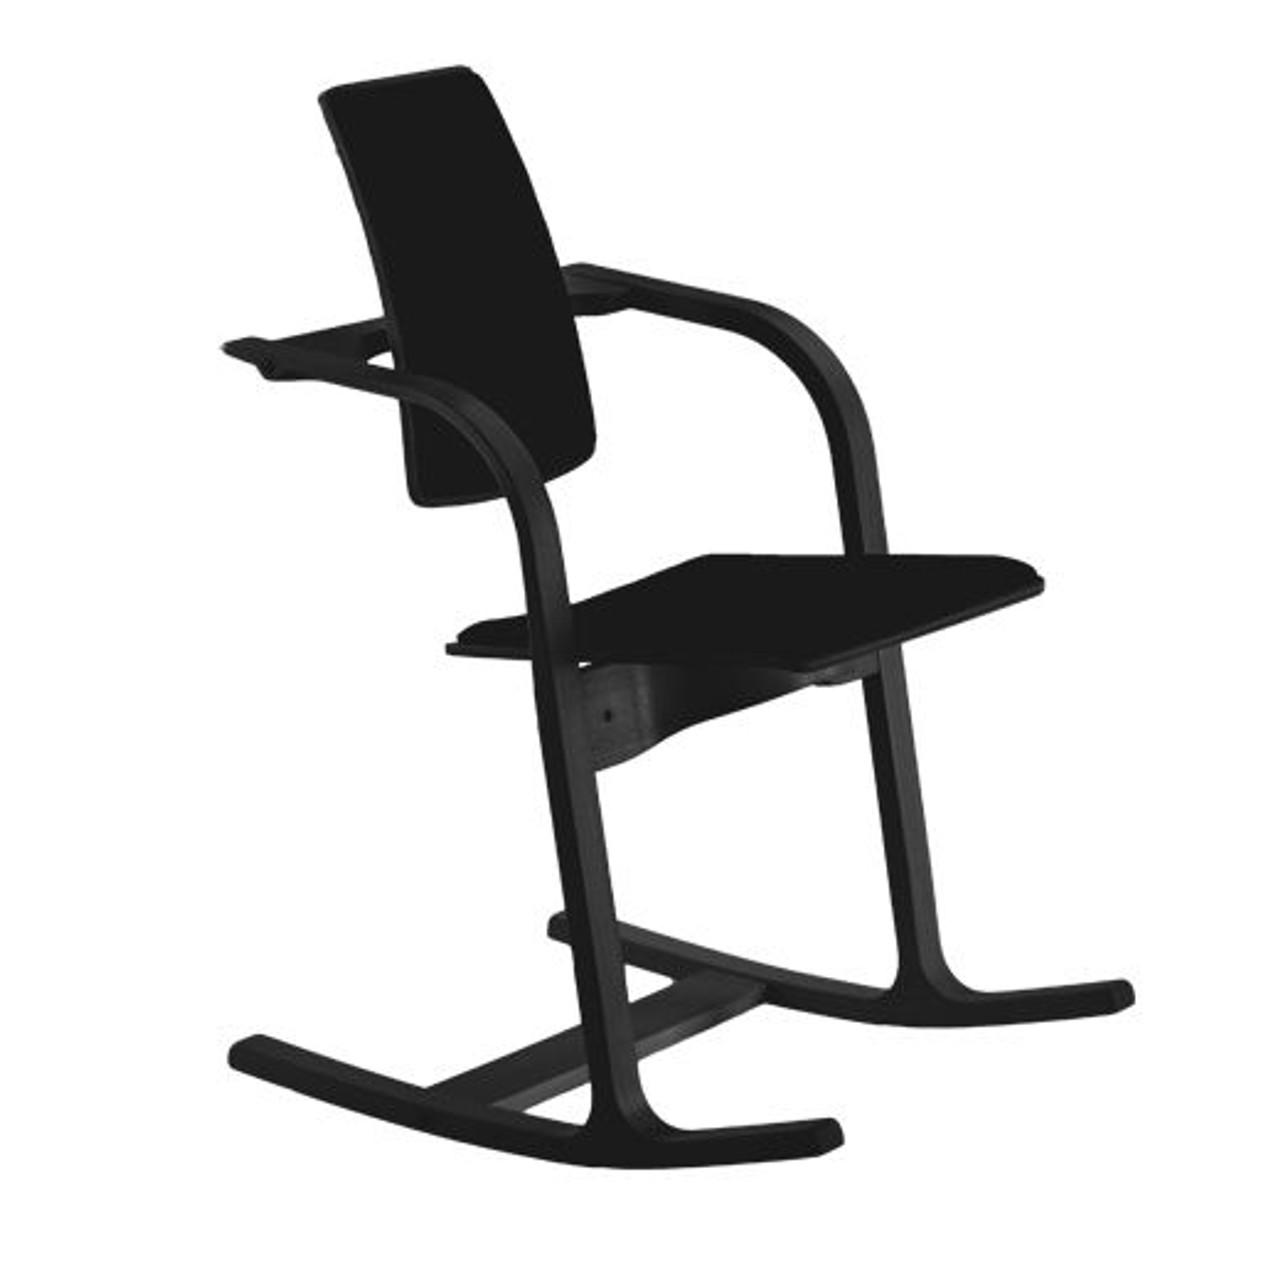 Rocking Office Desk Chair Ergonomic Rocking Chair